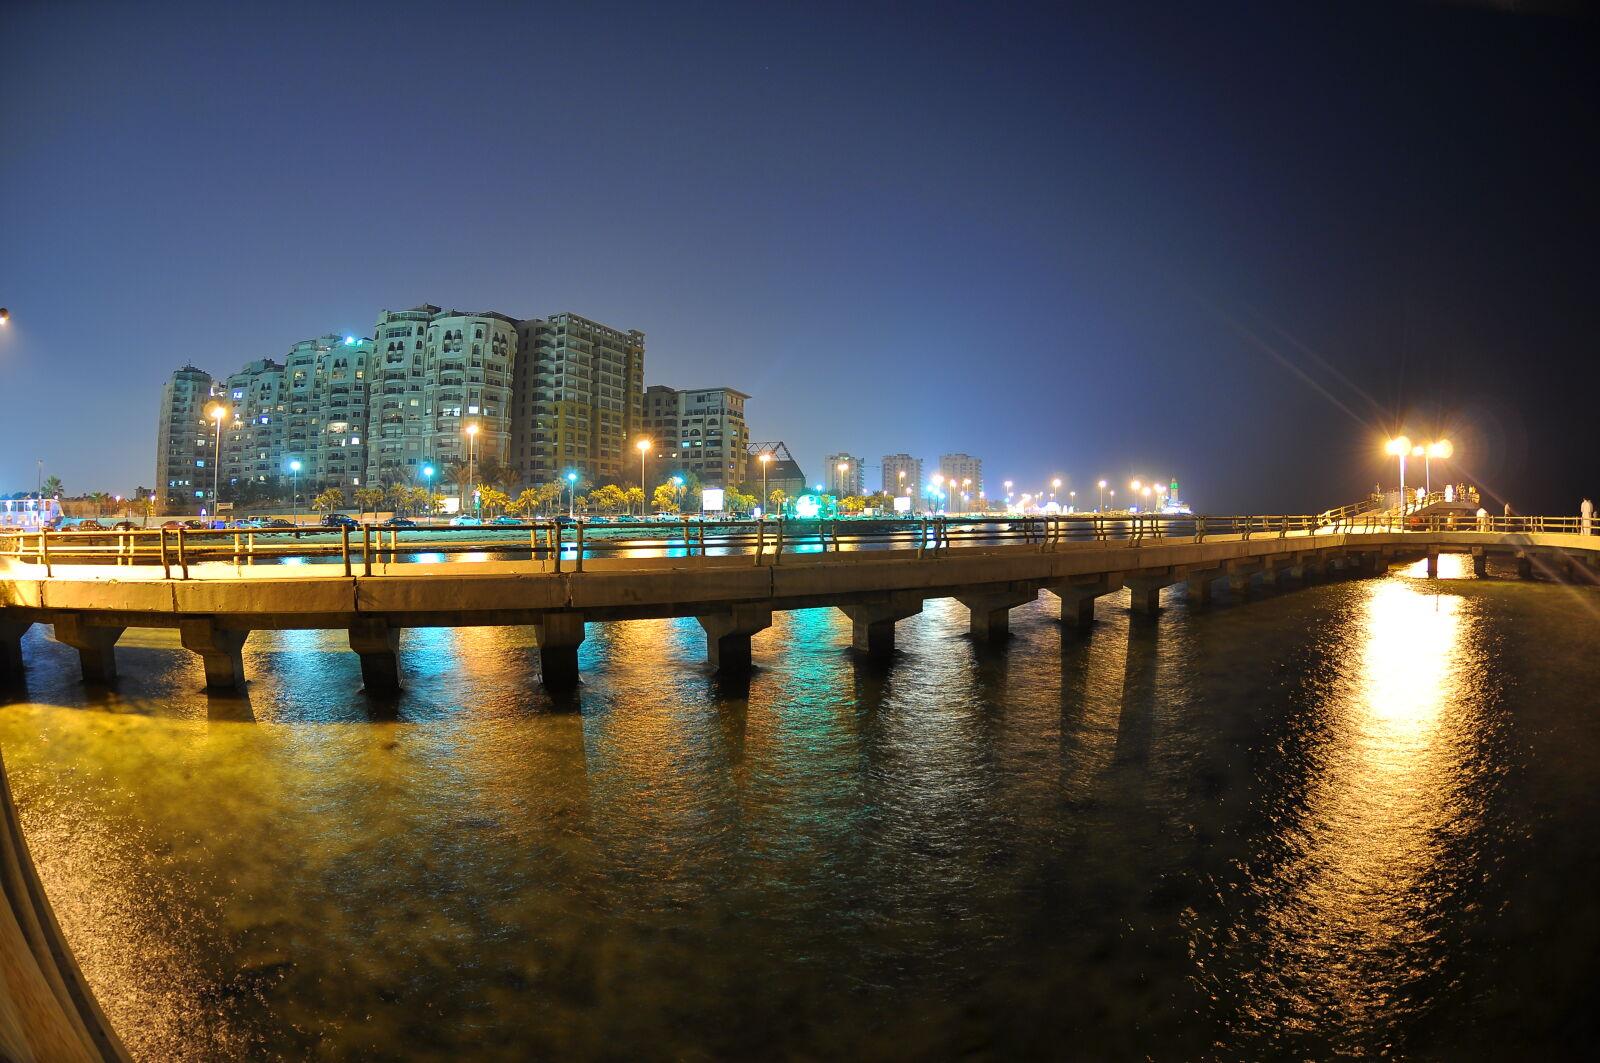 bridge, buildings, city, night photography